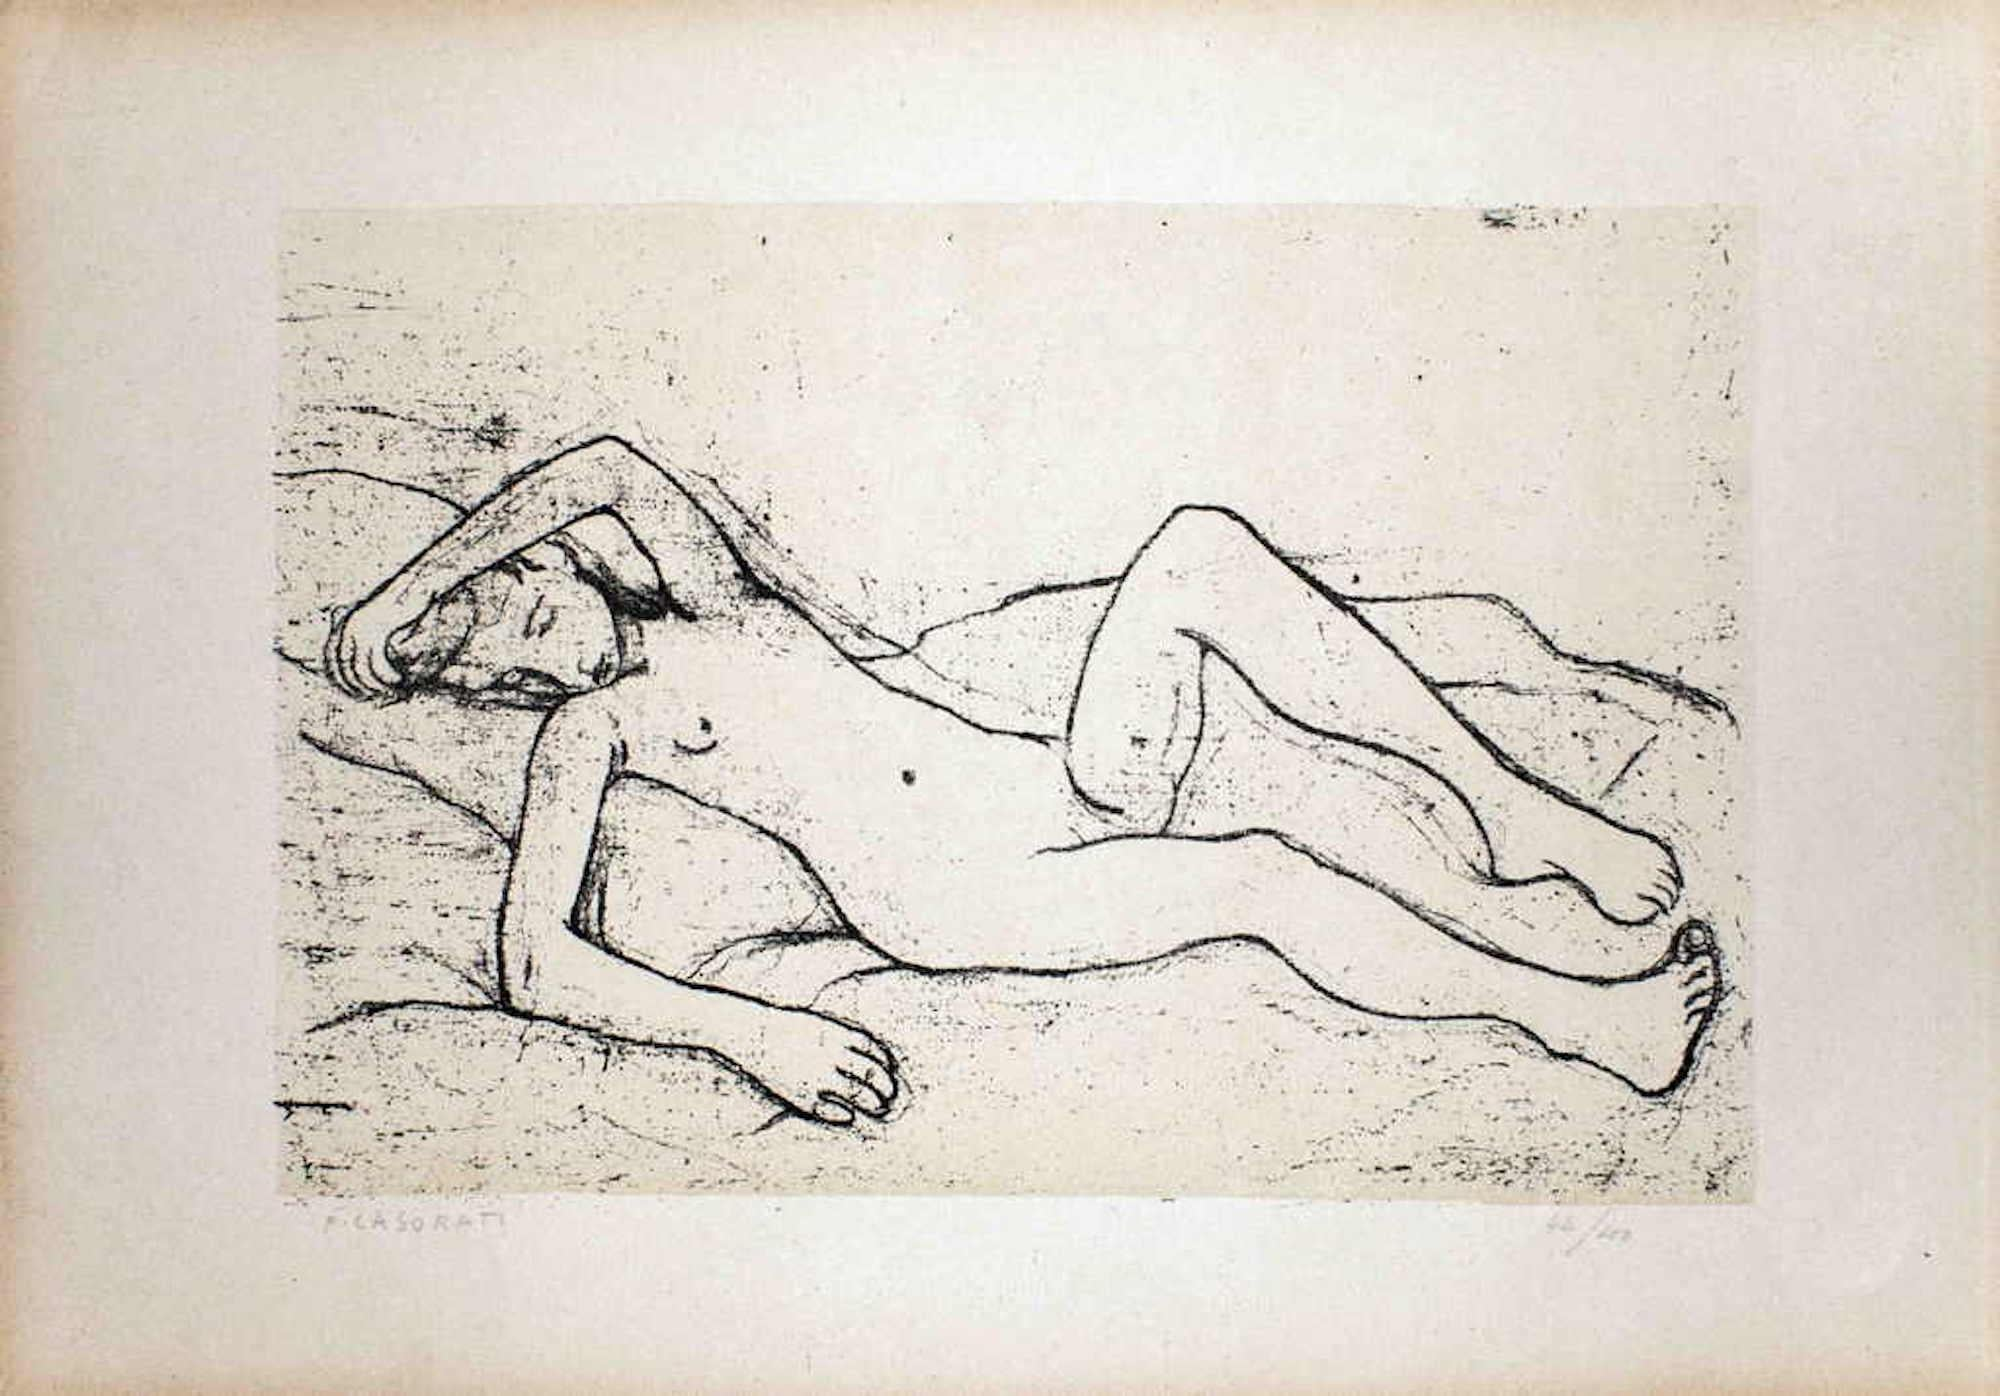 Lying Nude Woman - Original Lithograph by Felice Casorati - 1946